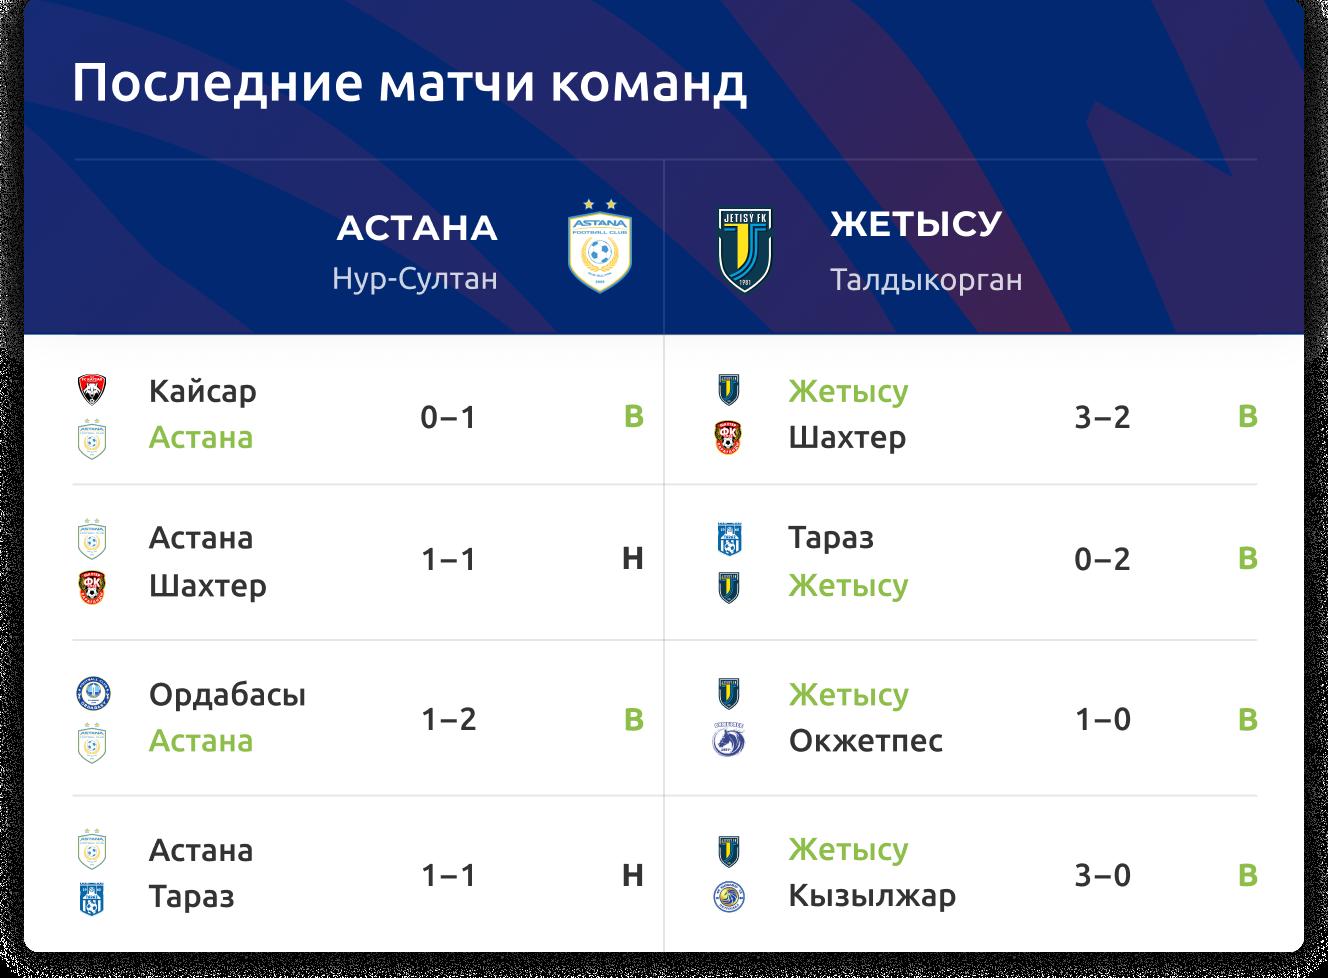 «Астана» – «Жетысу»: прогноз на КПЛ 27 сентября 2020 года